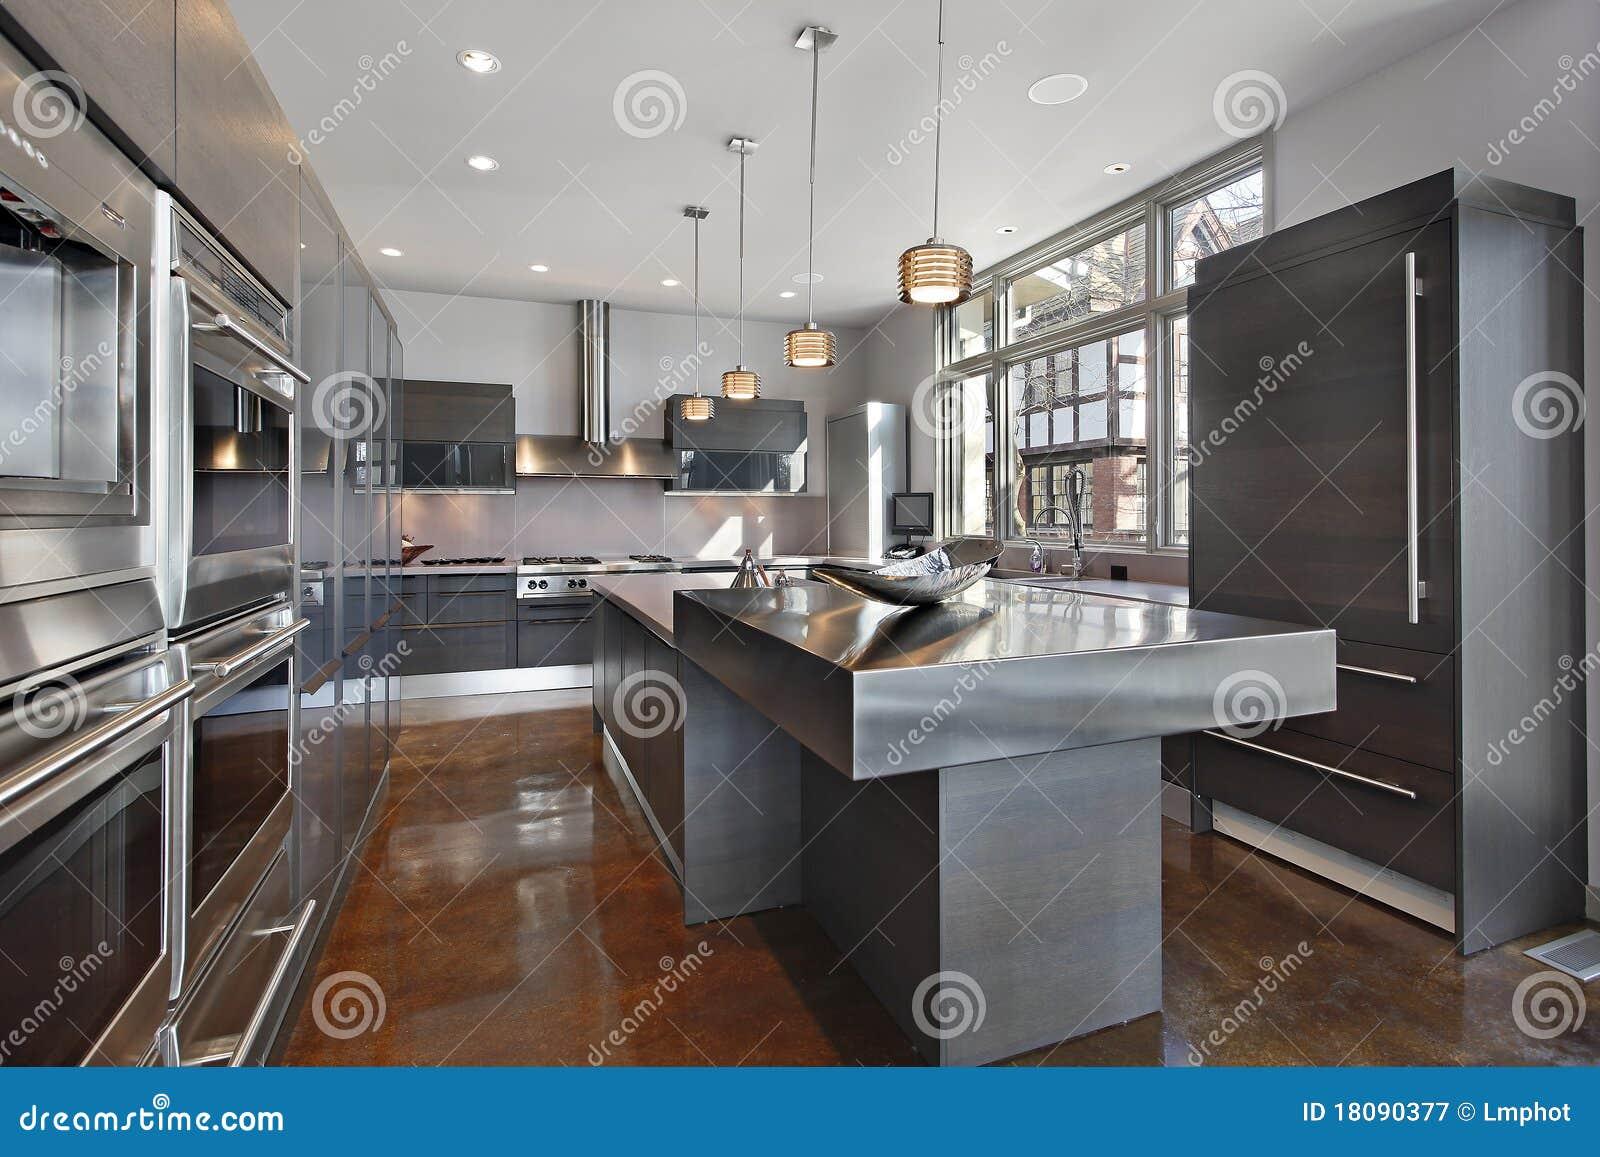 Moderne Keukens Afbeeldingen : Ultra moderne keuken stock afbeelding afbeelding bestaande uit